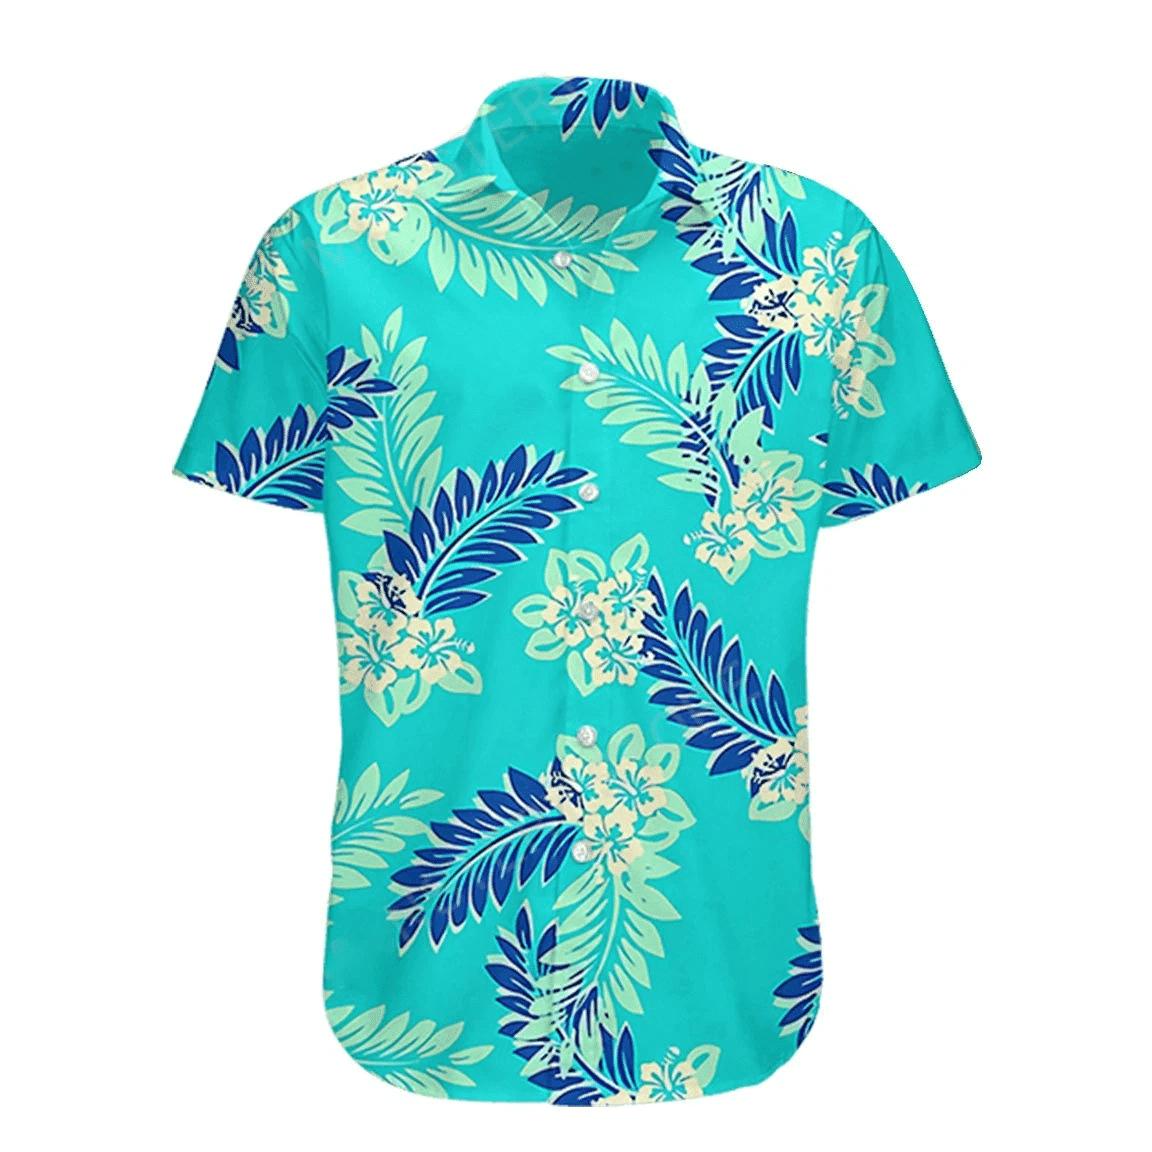 Tommy Vercetti GTA Vice City Hawaiian Shirt